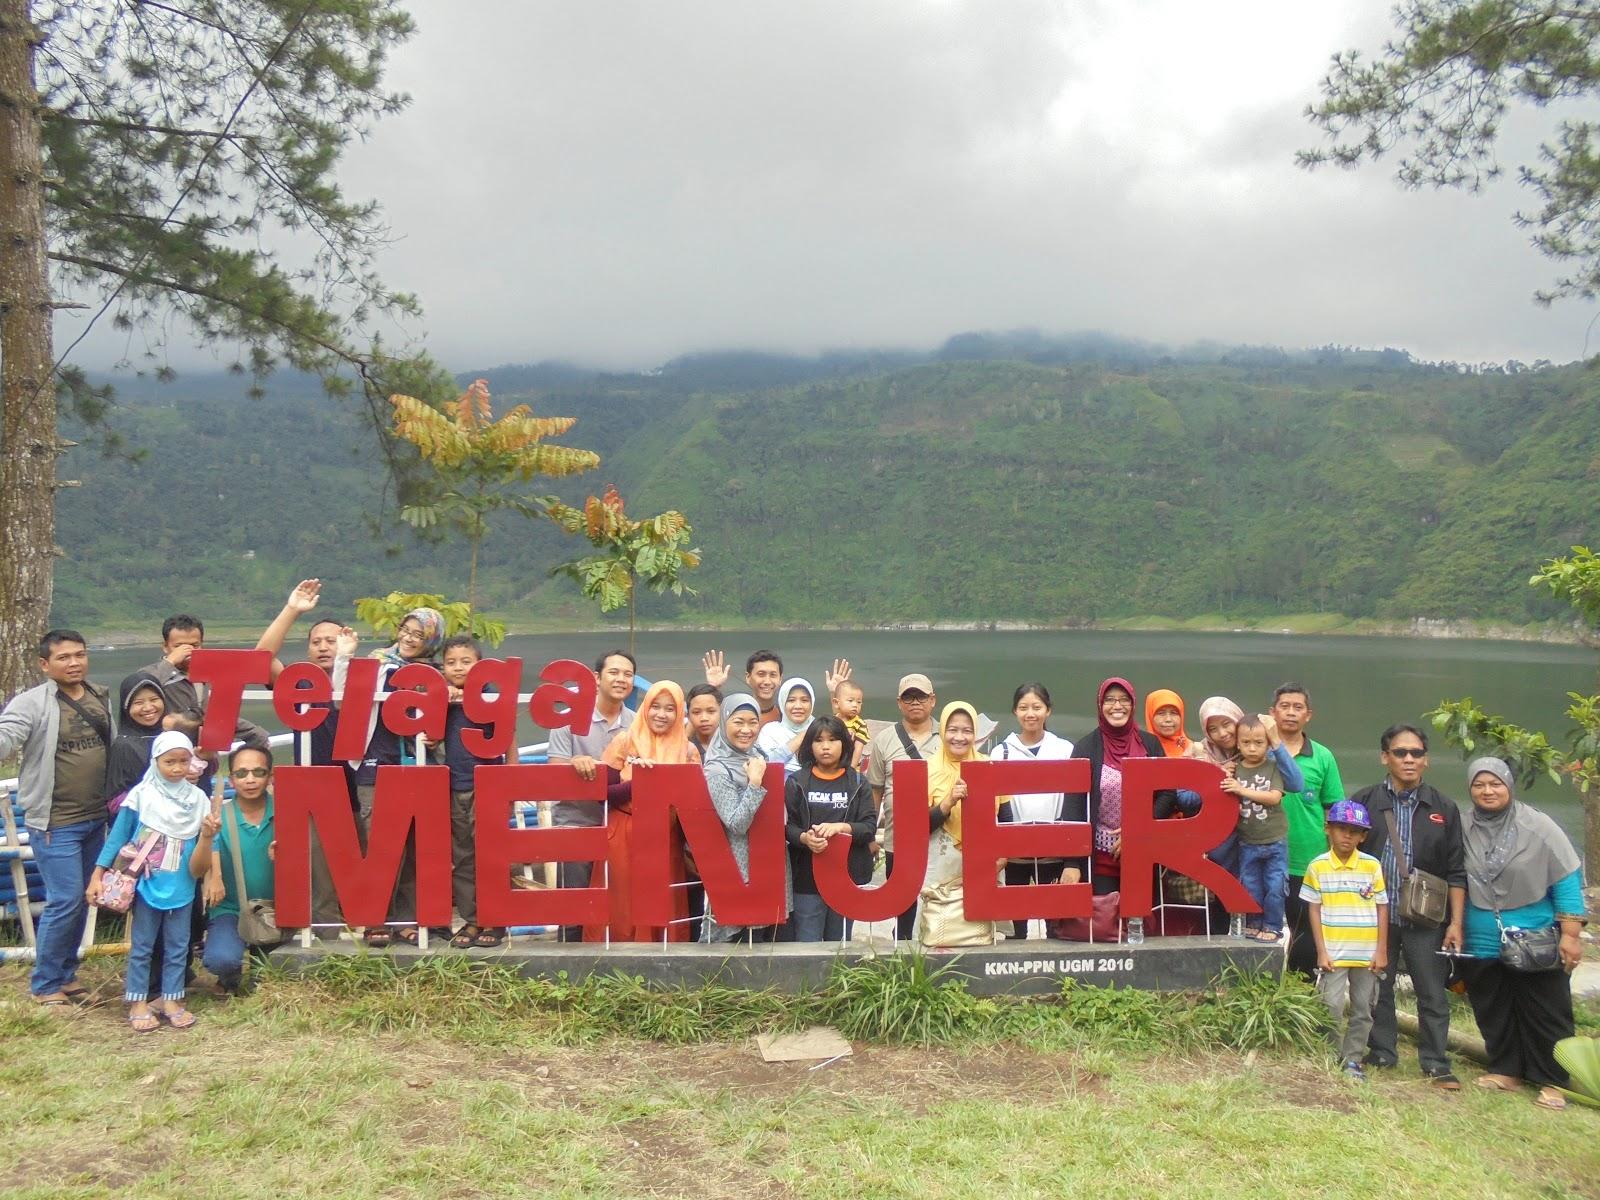 Tempat Wisata Dieng 9 - Area Wisata Asia